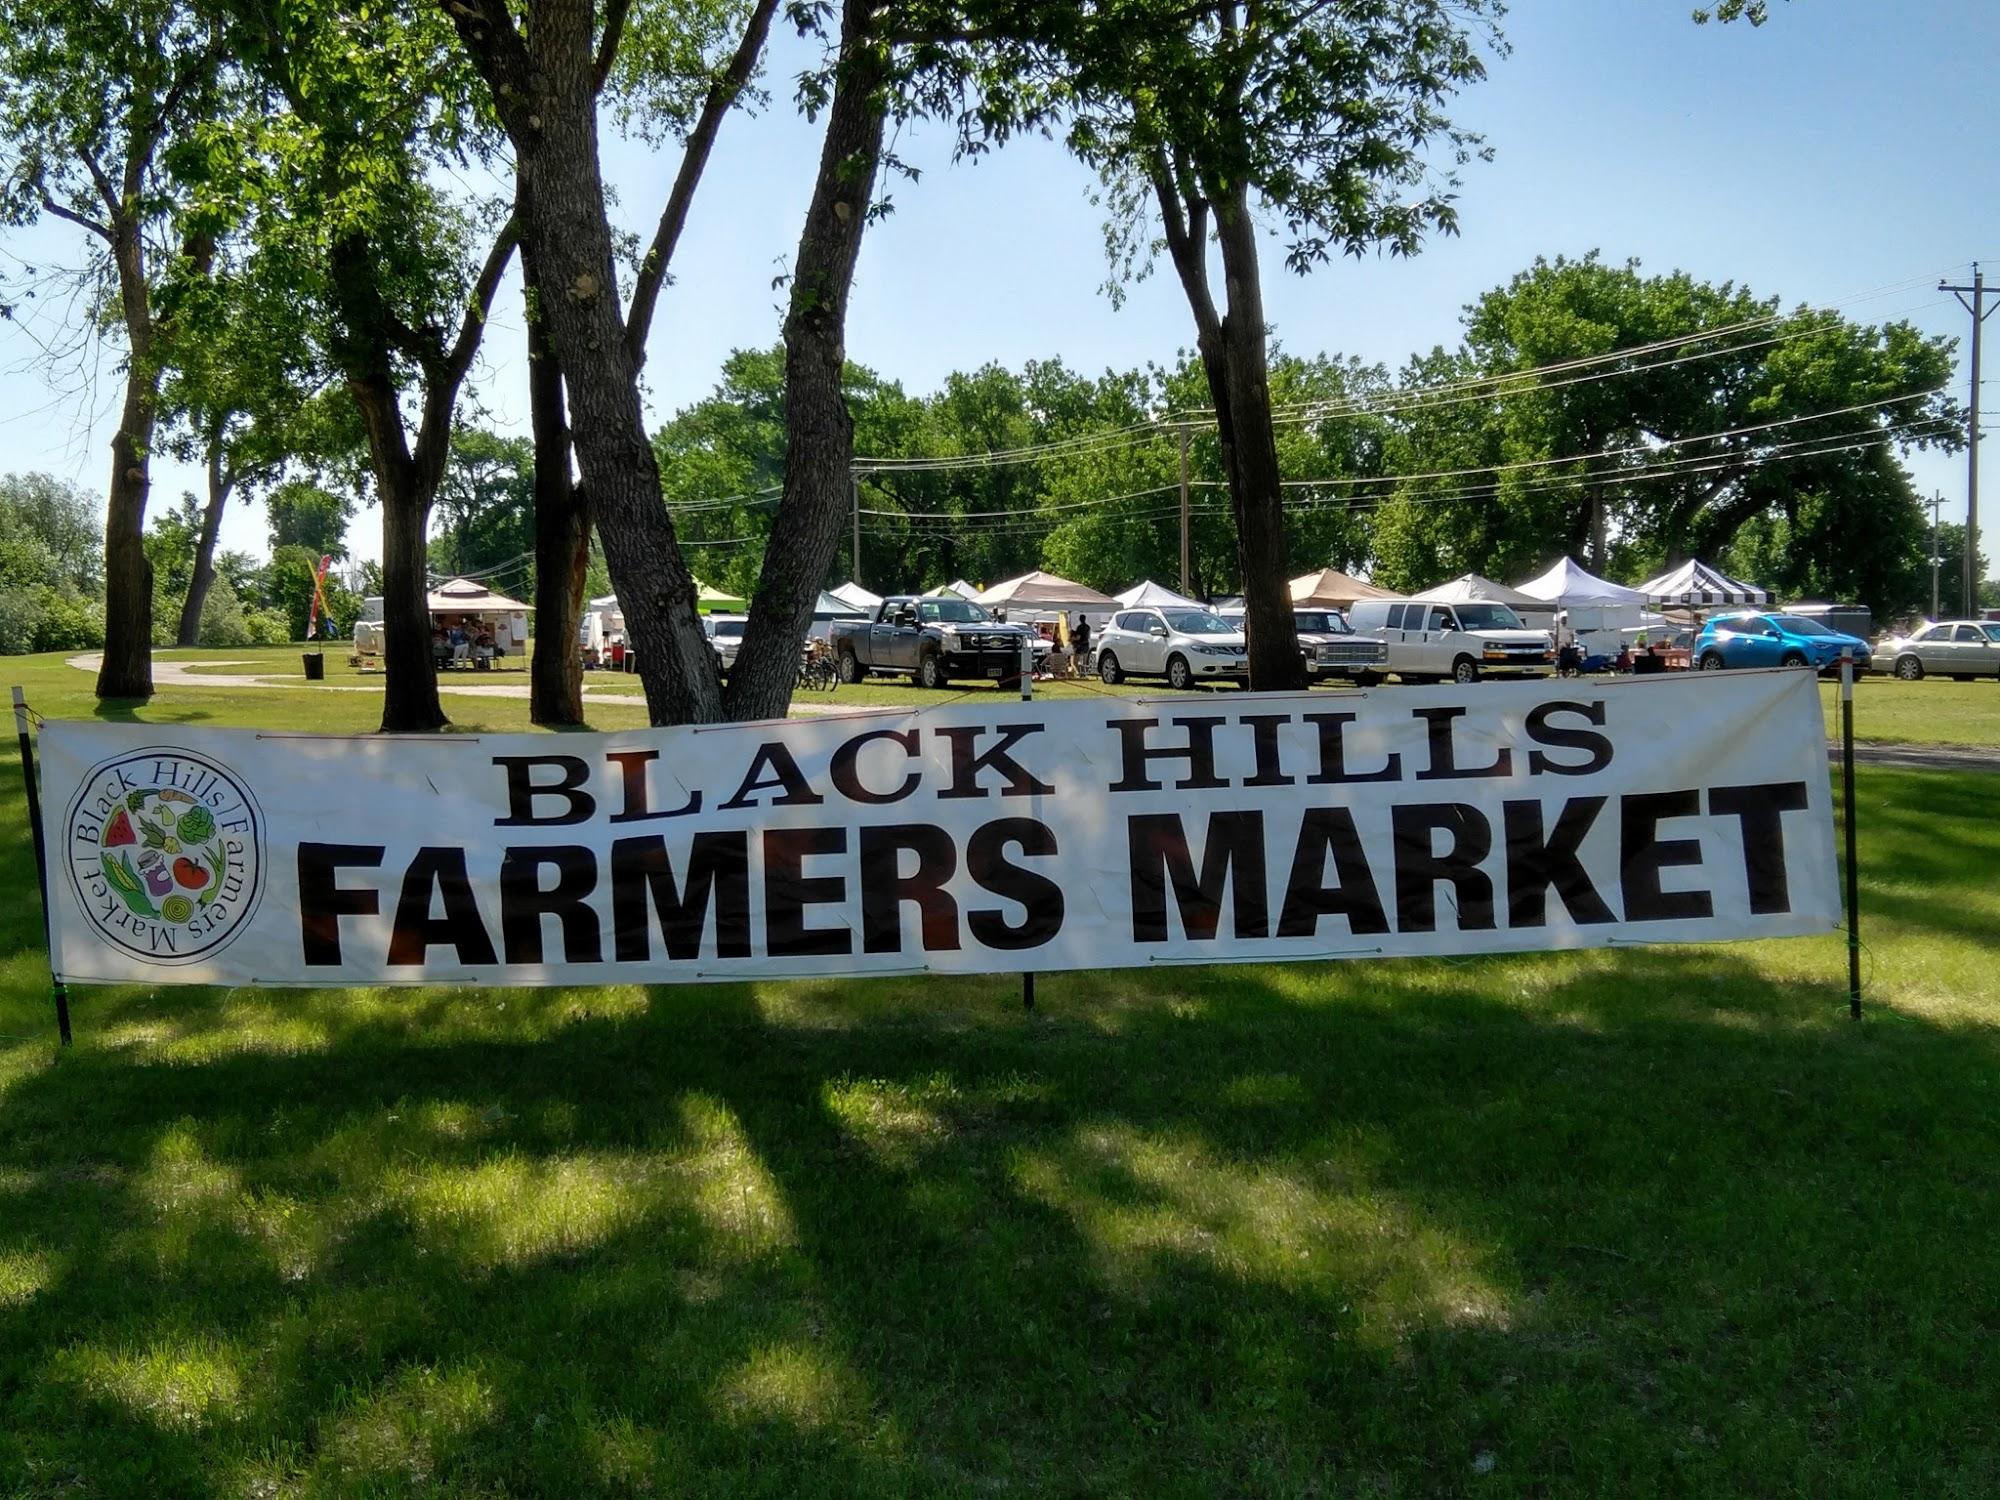 Black Hills Farmers Market 245 E Omaha St, Rapid City